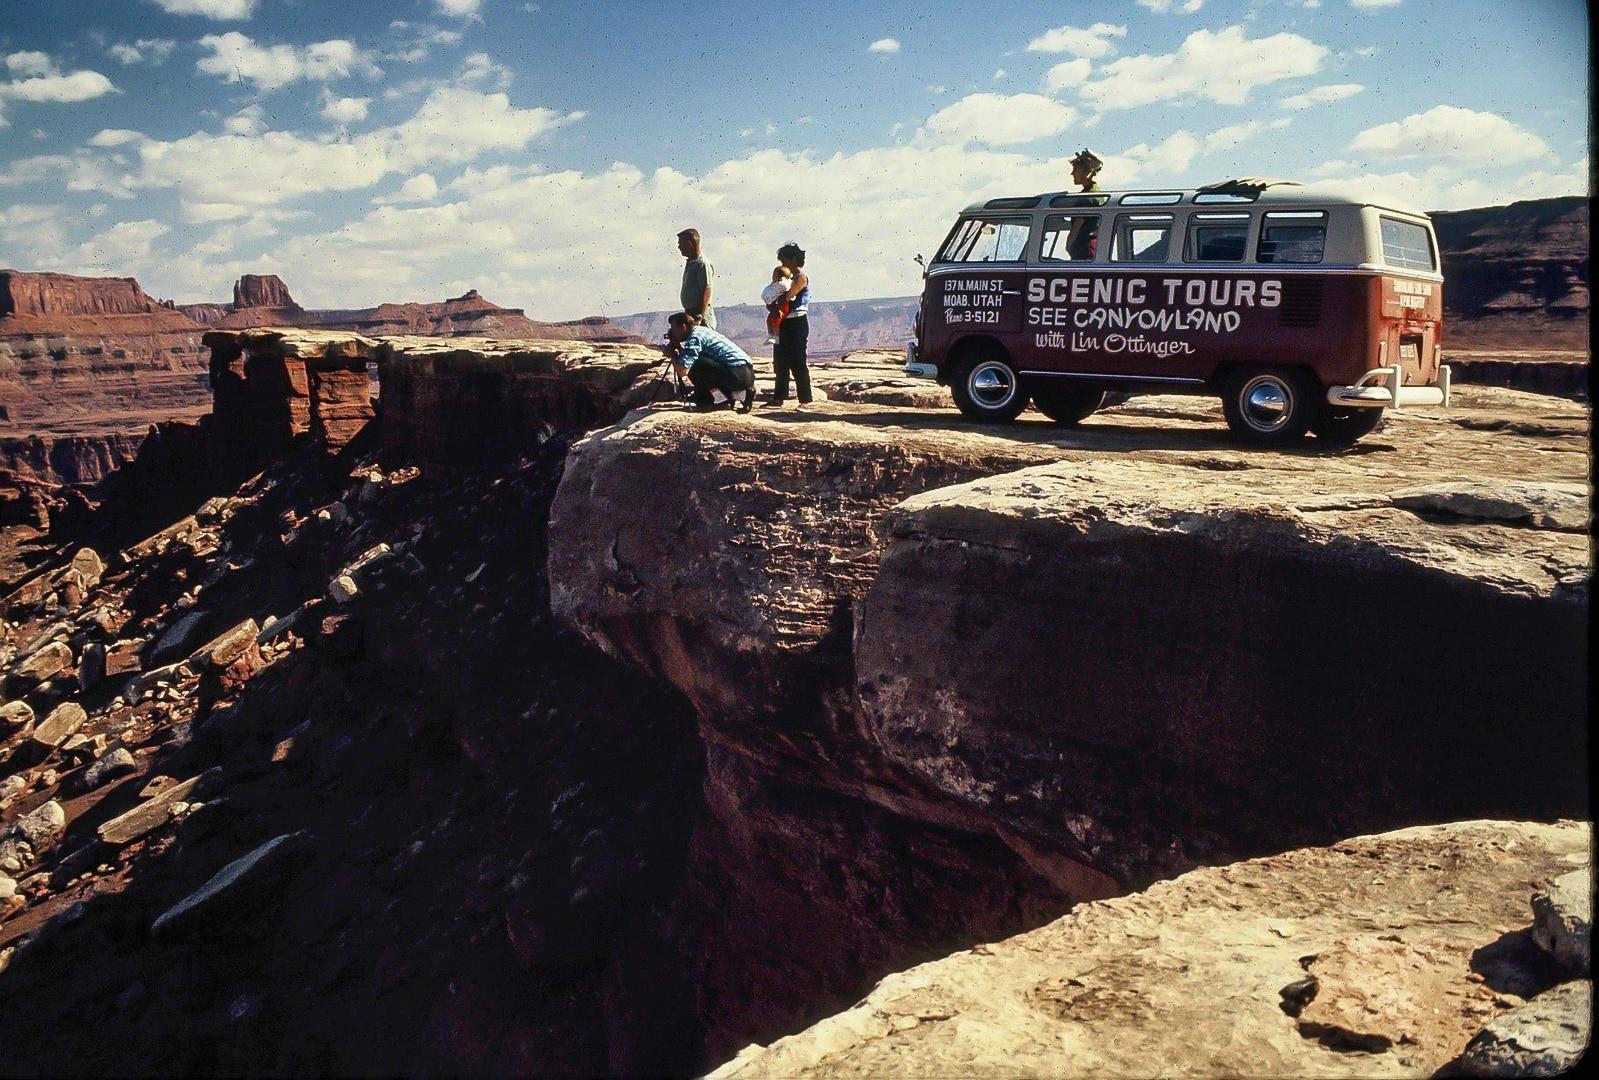 Lin Ottinger Canyon Land Scenic Tour VW Bus - BeCombi - Une-4